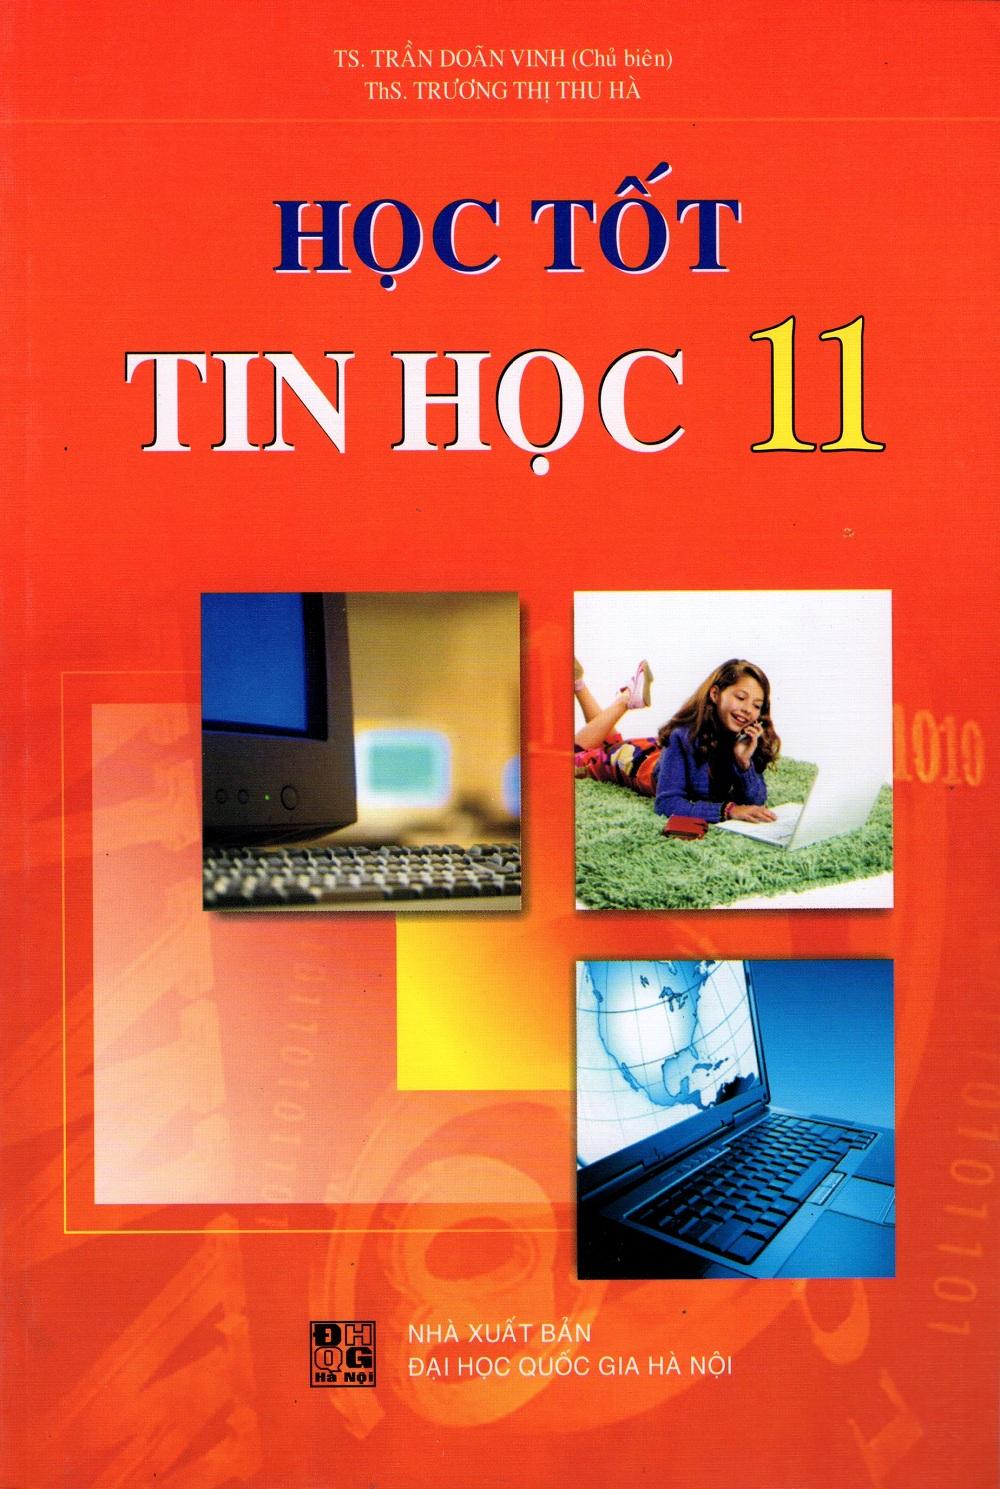 Học Tốt Tin Học Lớp 11 - 8936036303926,62_220920,30000,tiki.vn,Hoc-Tot-Tin-Hoc-Lop-11-62_220920,Học Tốt Tin Học Lớp 11